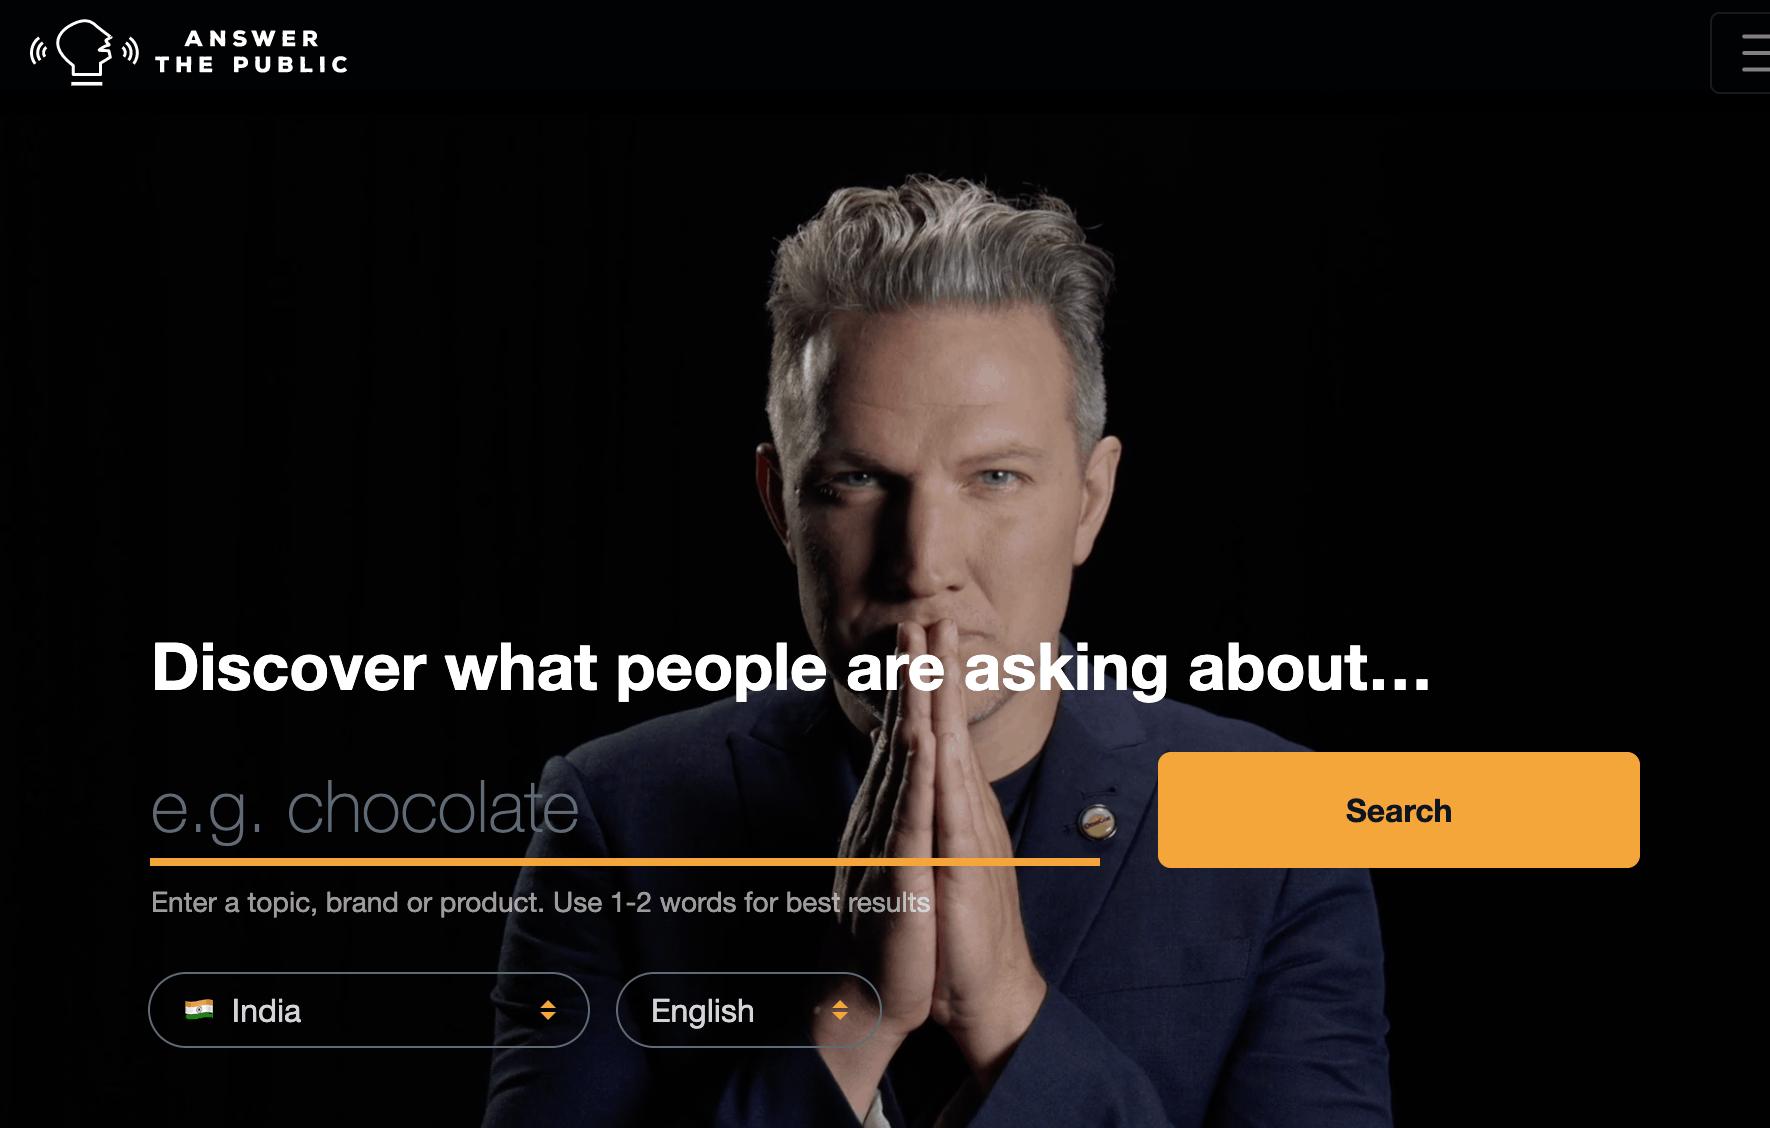 AnswerThePublic.com